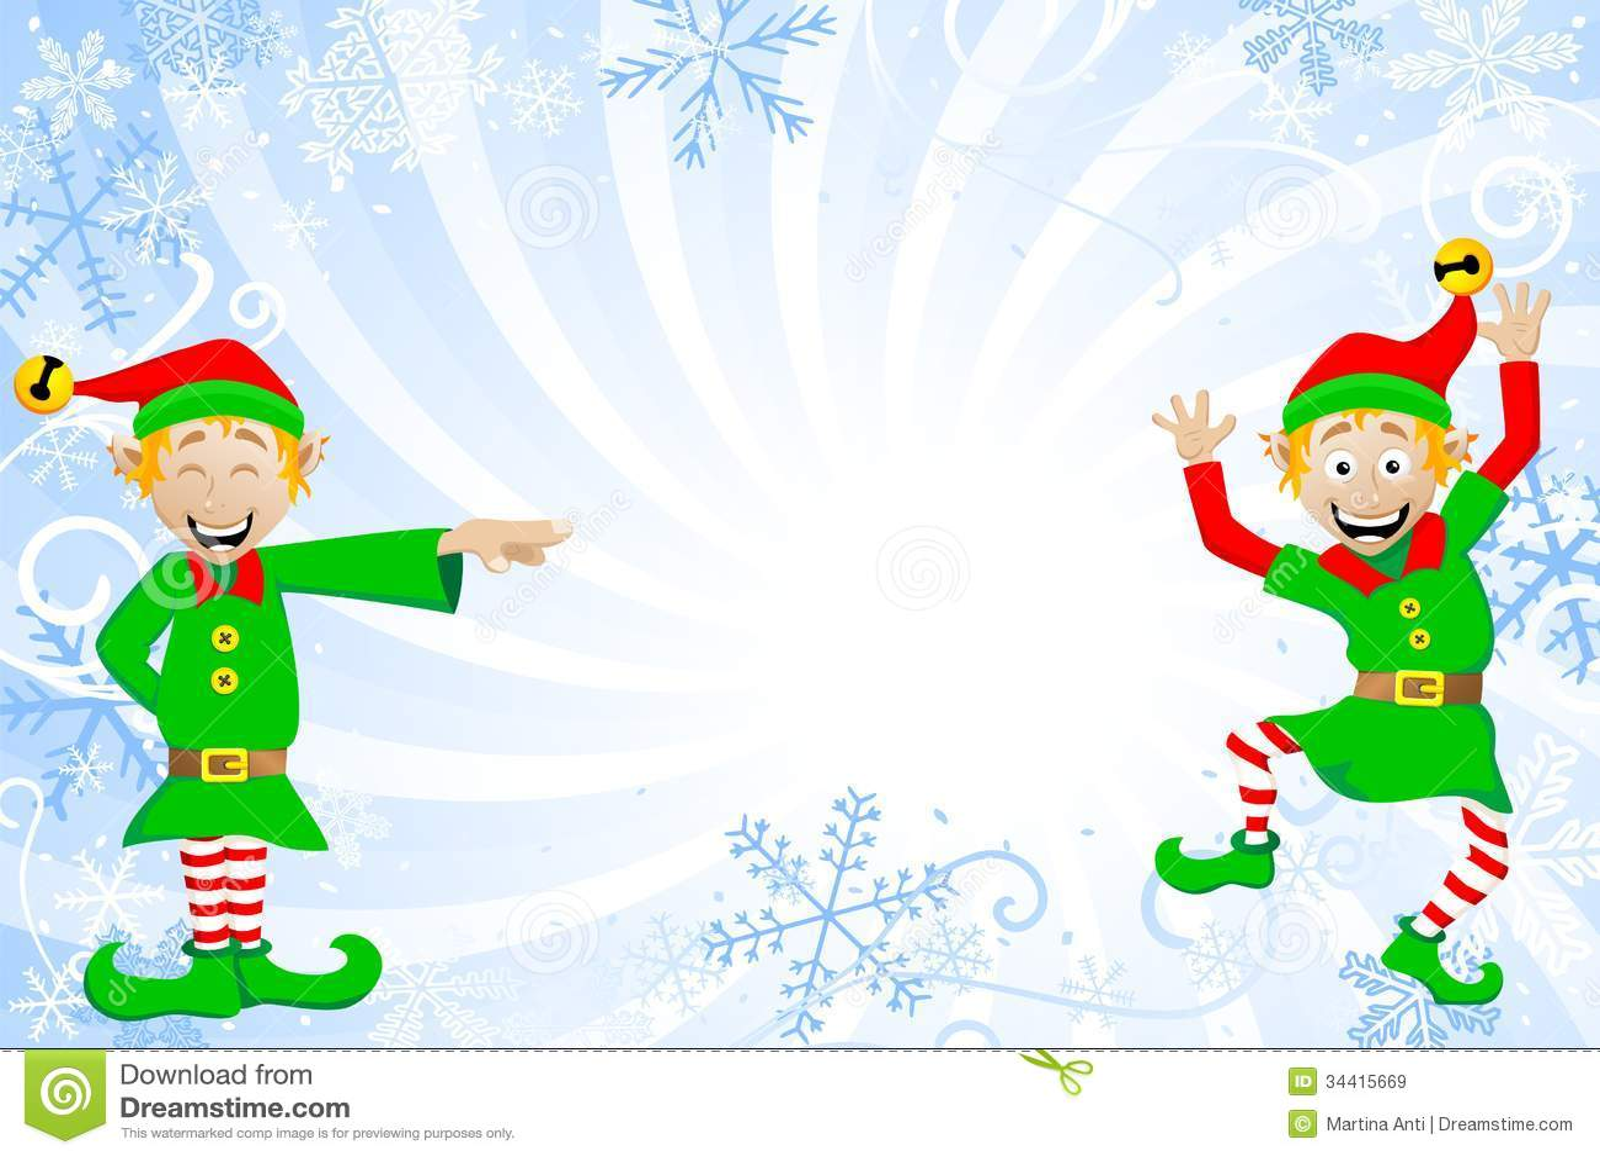 kids christmas backgrounds - Vaydile.euforic.co